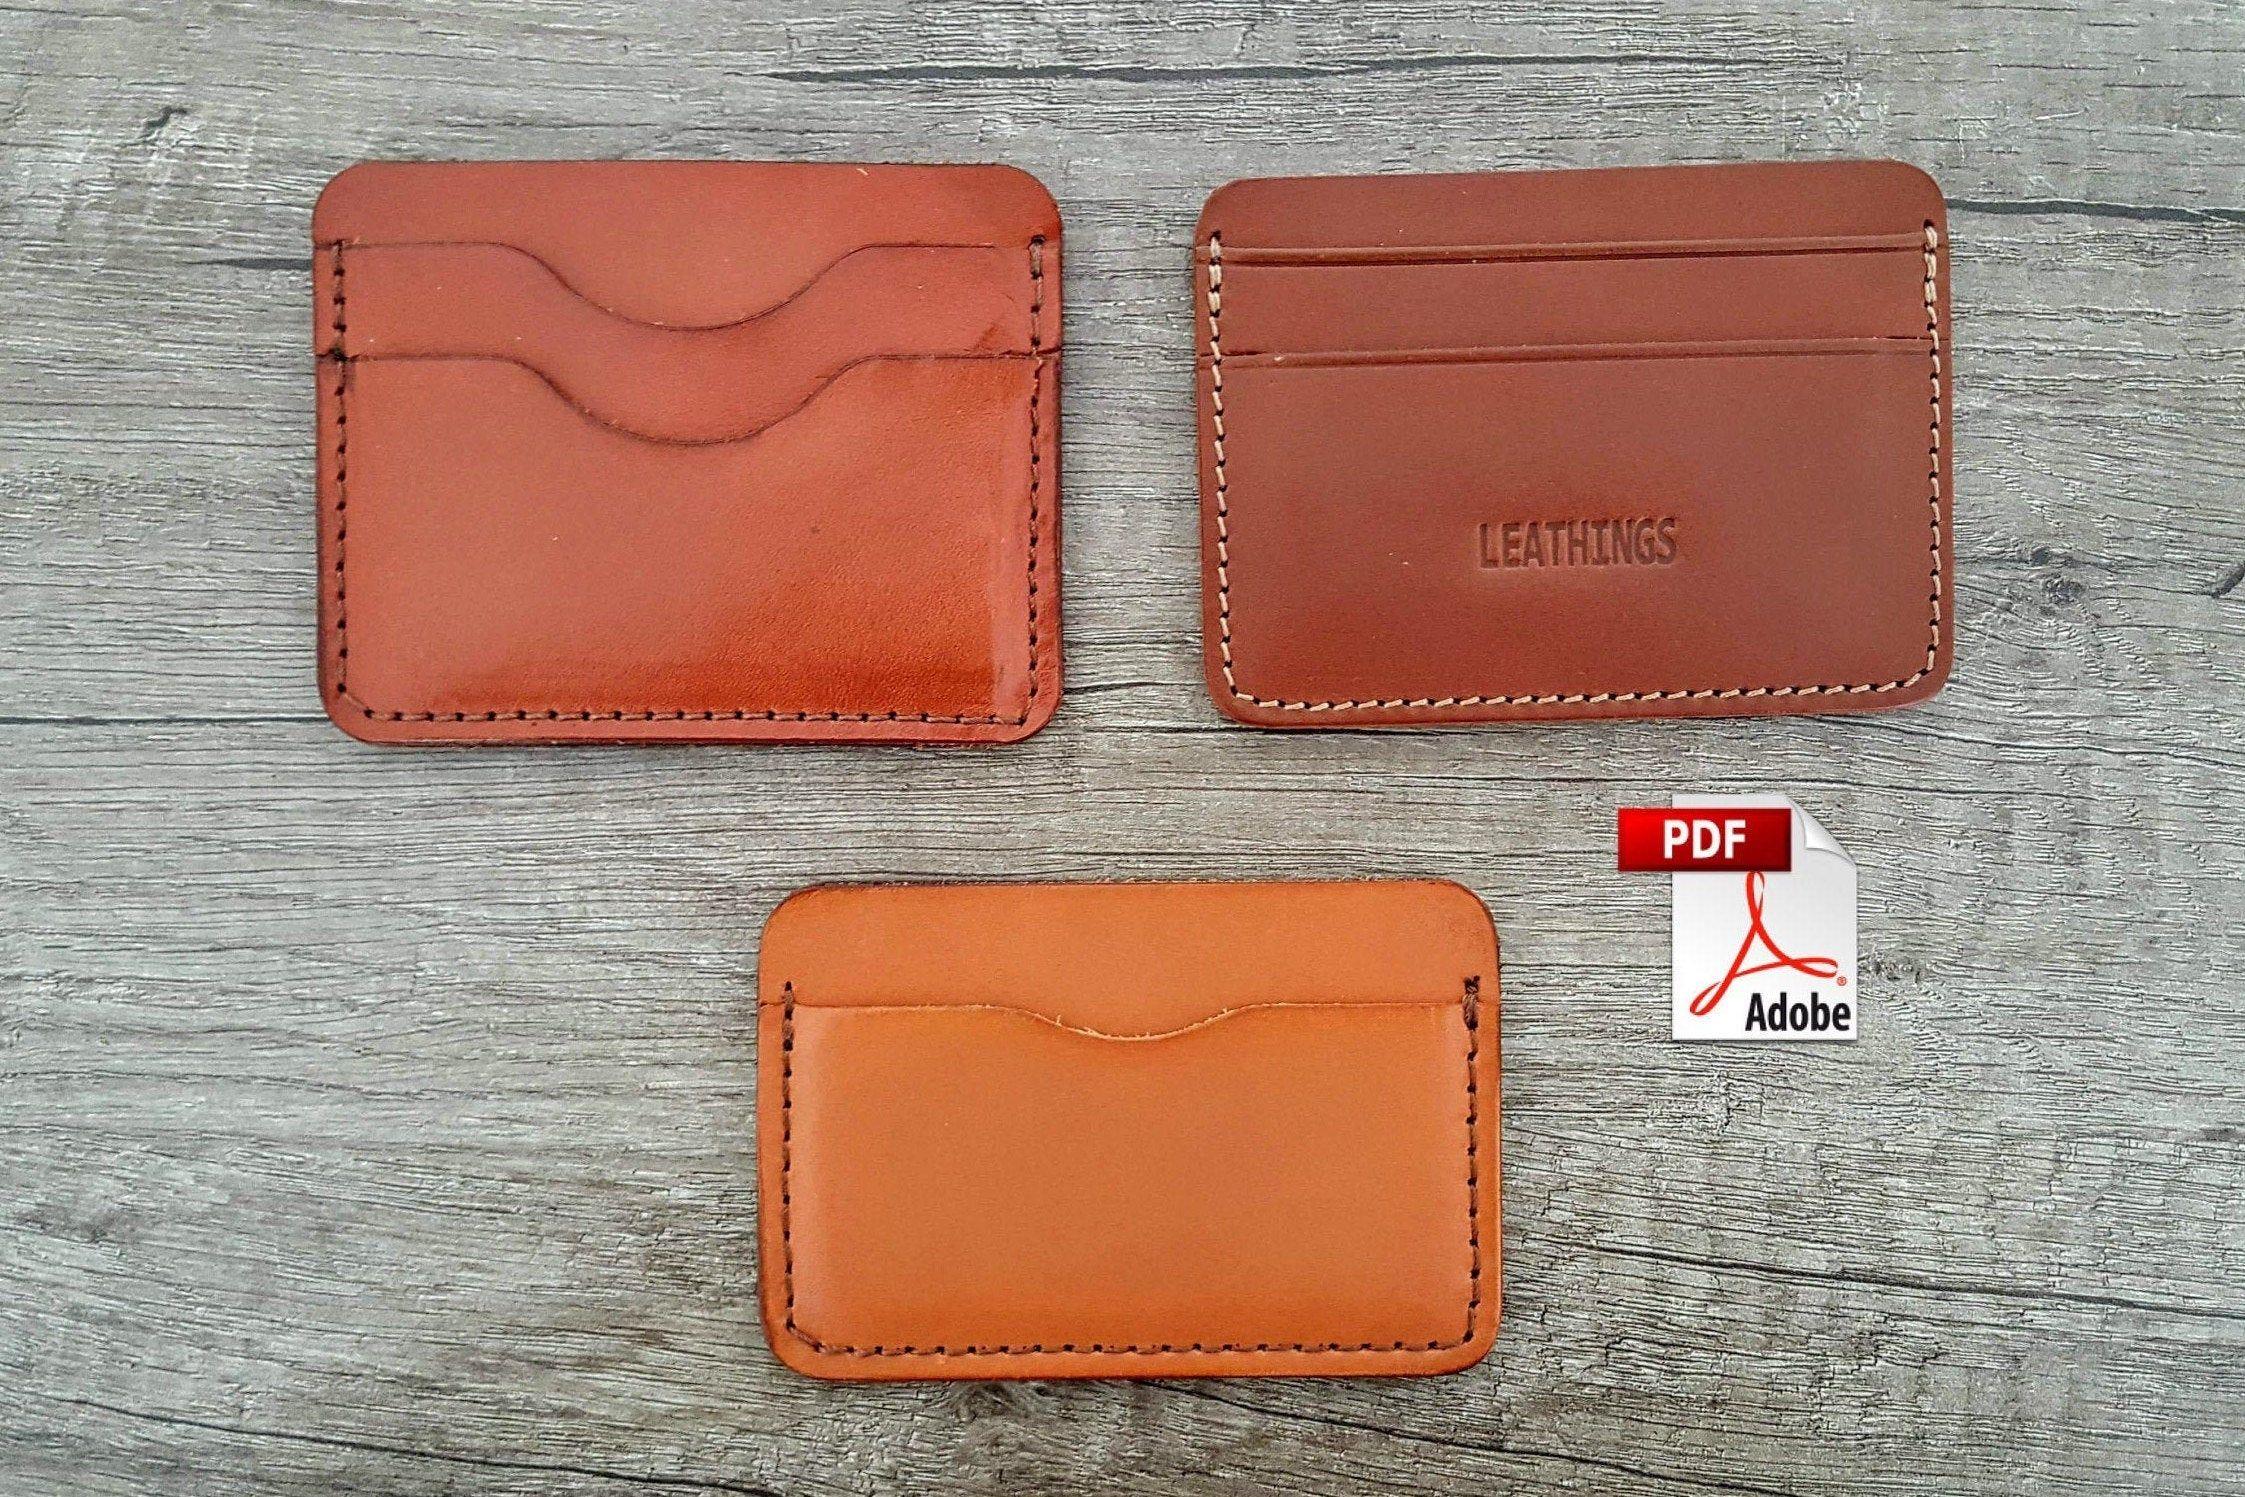 Pdf Slim Card Wallet Patterns 3 Different Pattern Leather Card Holders Template Minimal Front Pocket Diy Make Leather Credit Card Crafts